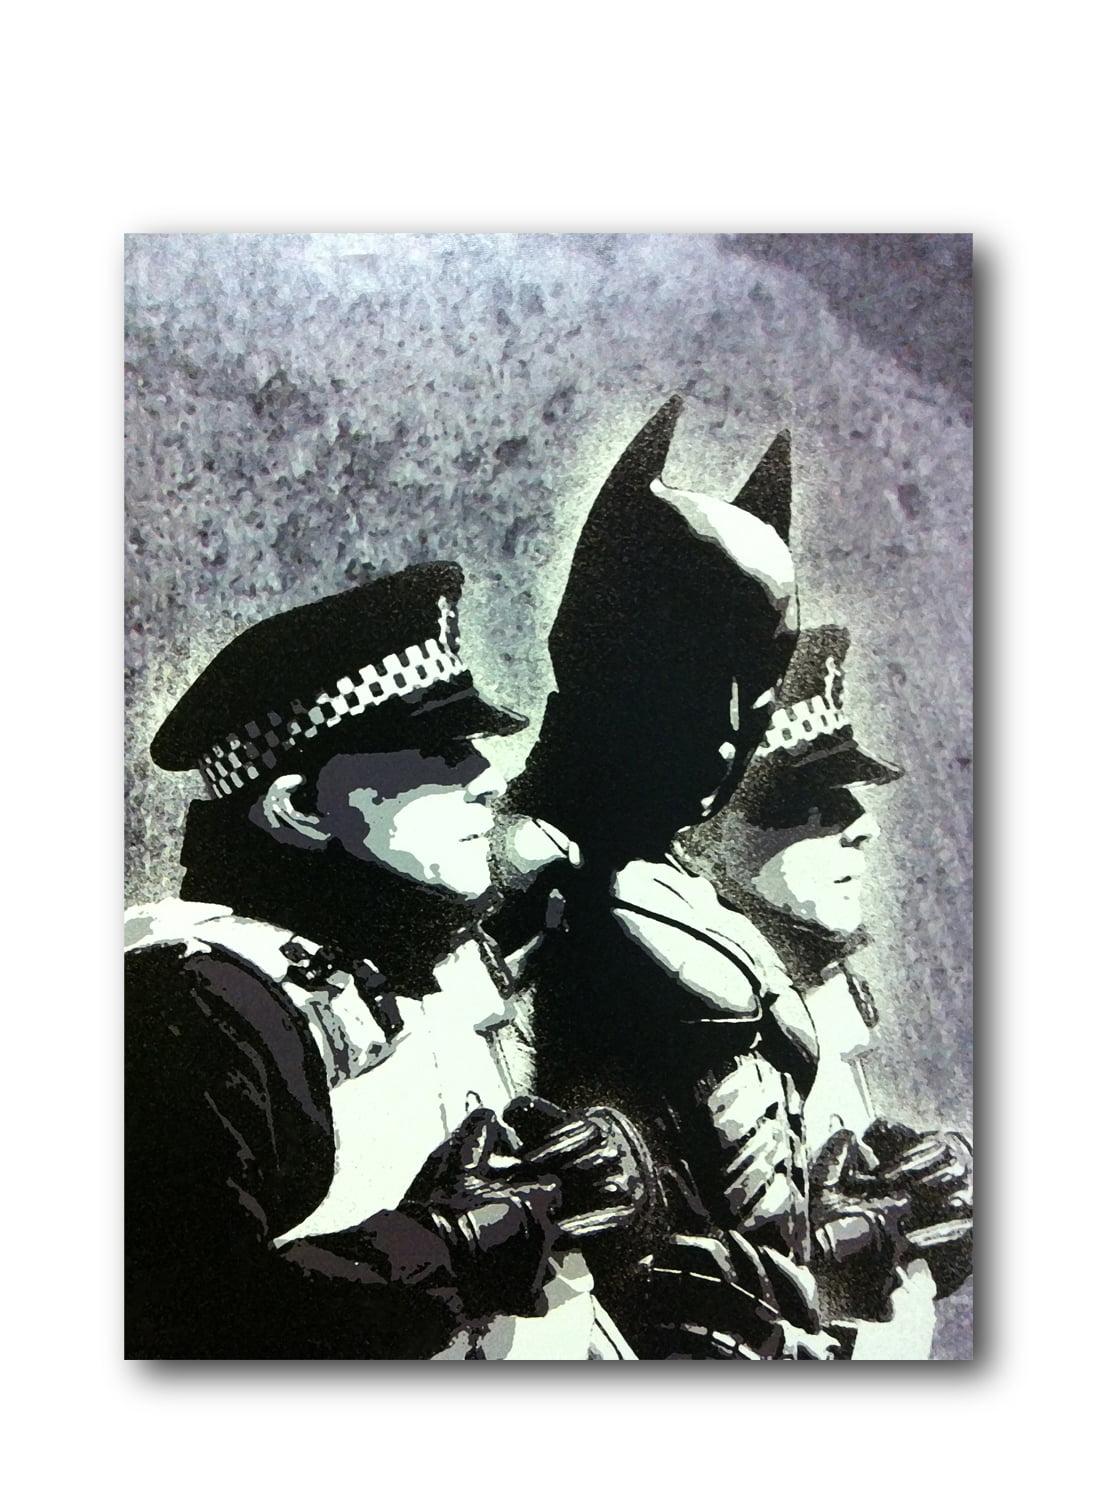 "Banksy Batman Police Arrest Brushed Aluminum Metal Print (14"" x 11"") by Pingotopia Inc."